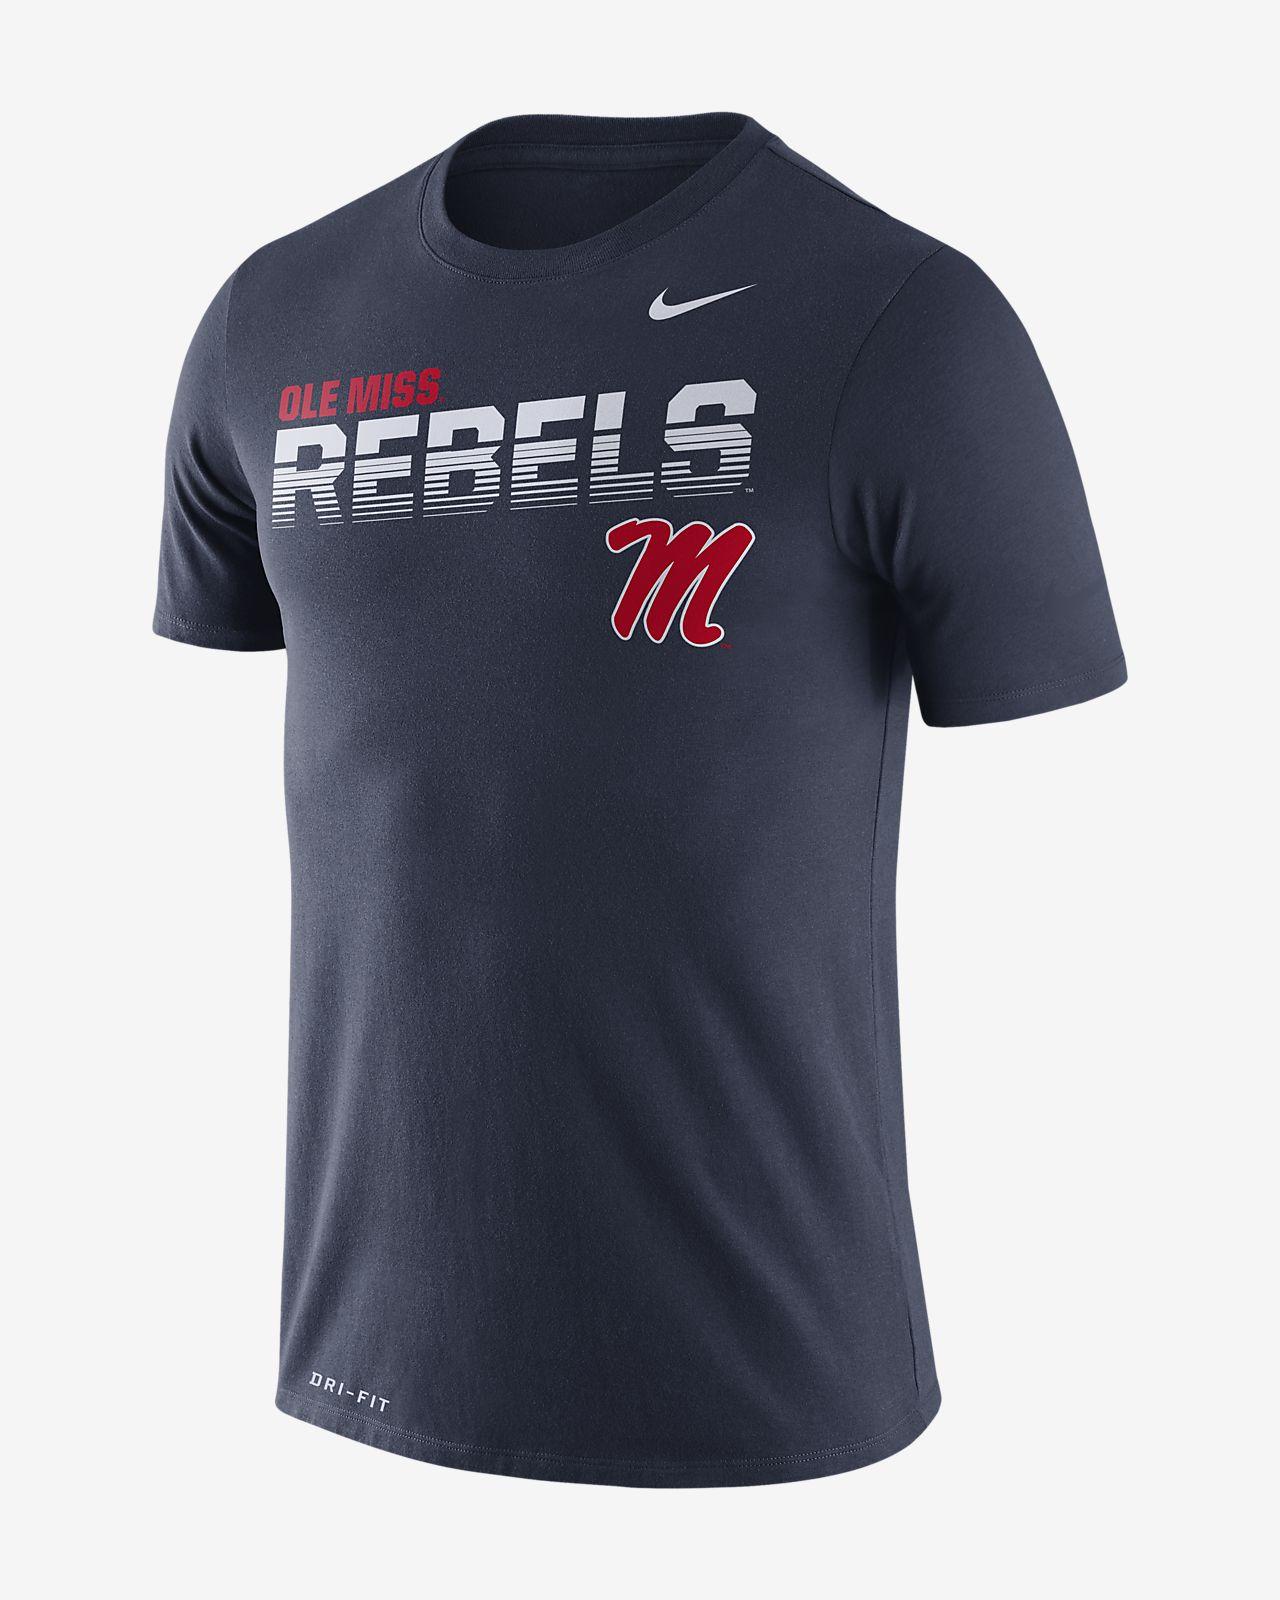 Nike College Dri-FIT Legend (Mississippi) Men's T-Shirt